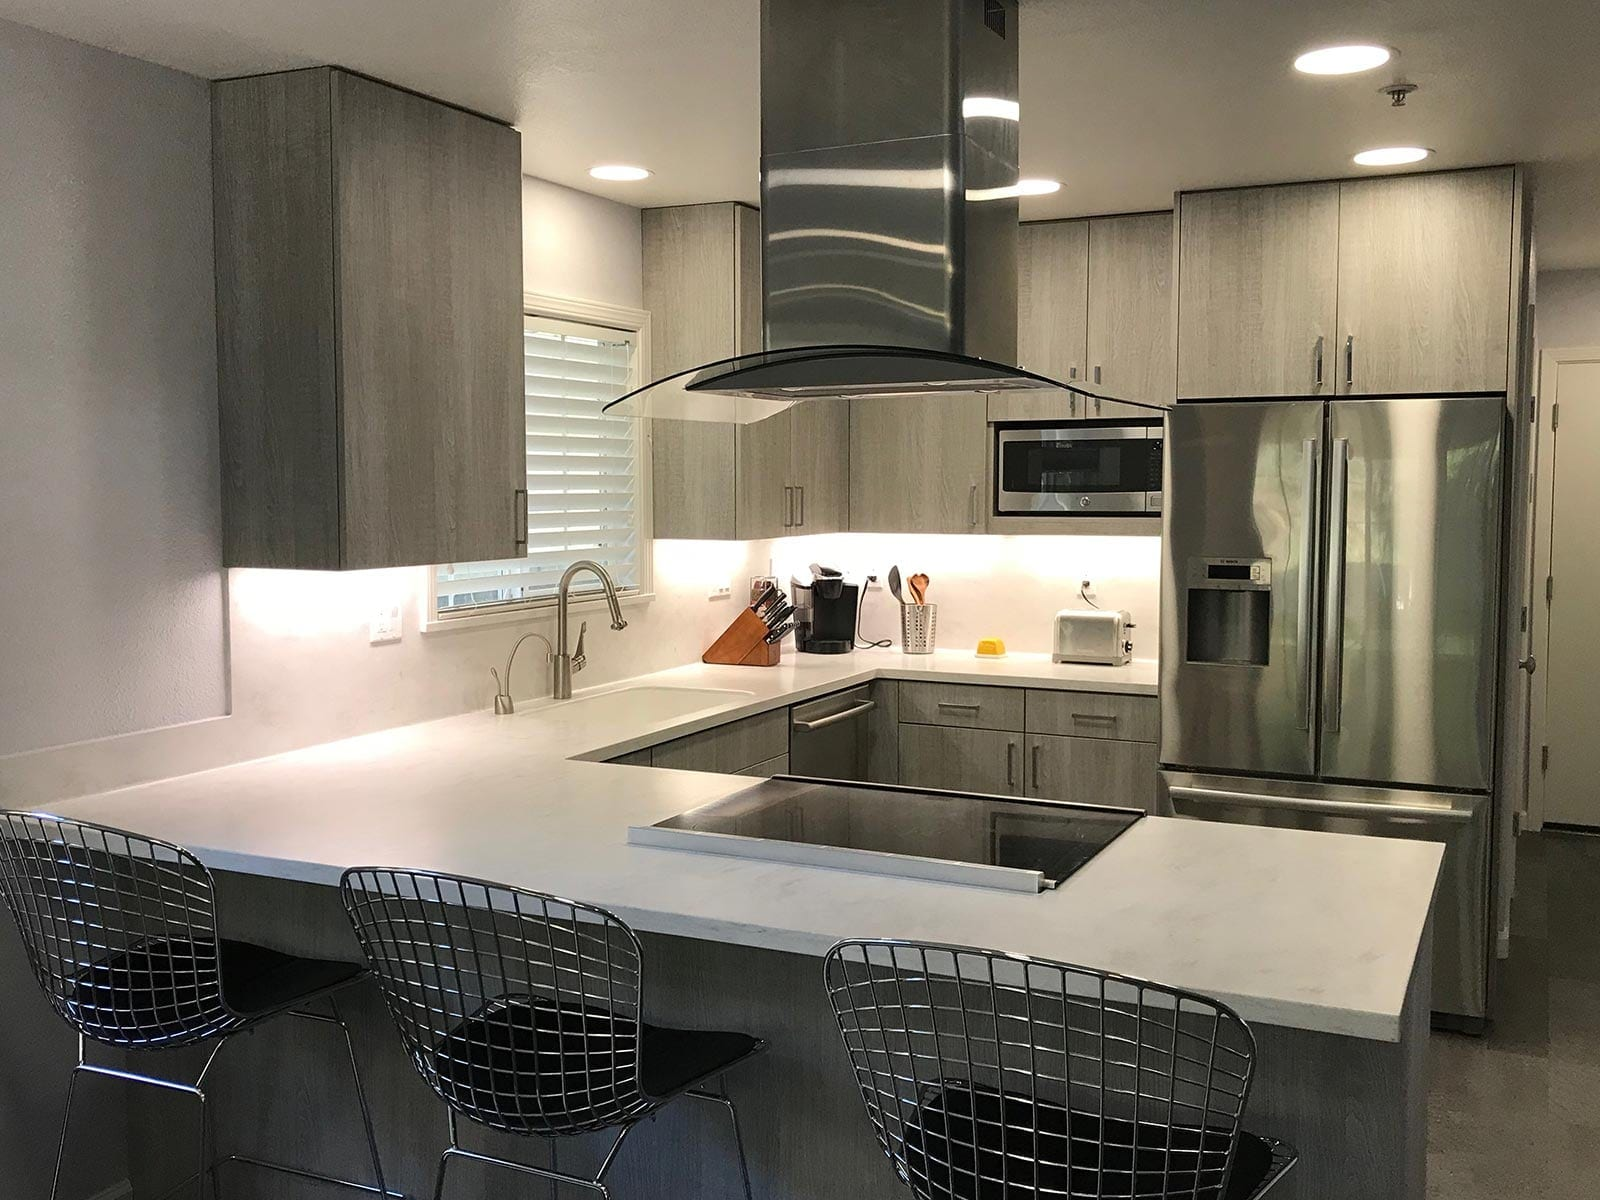 Kitchens | California Space Organizers